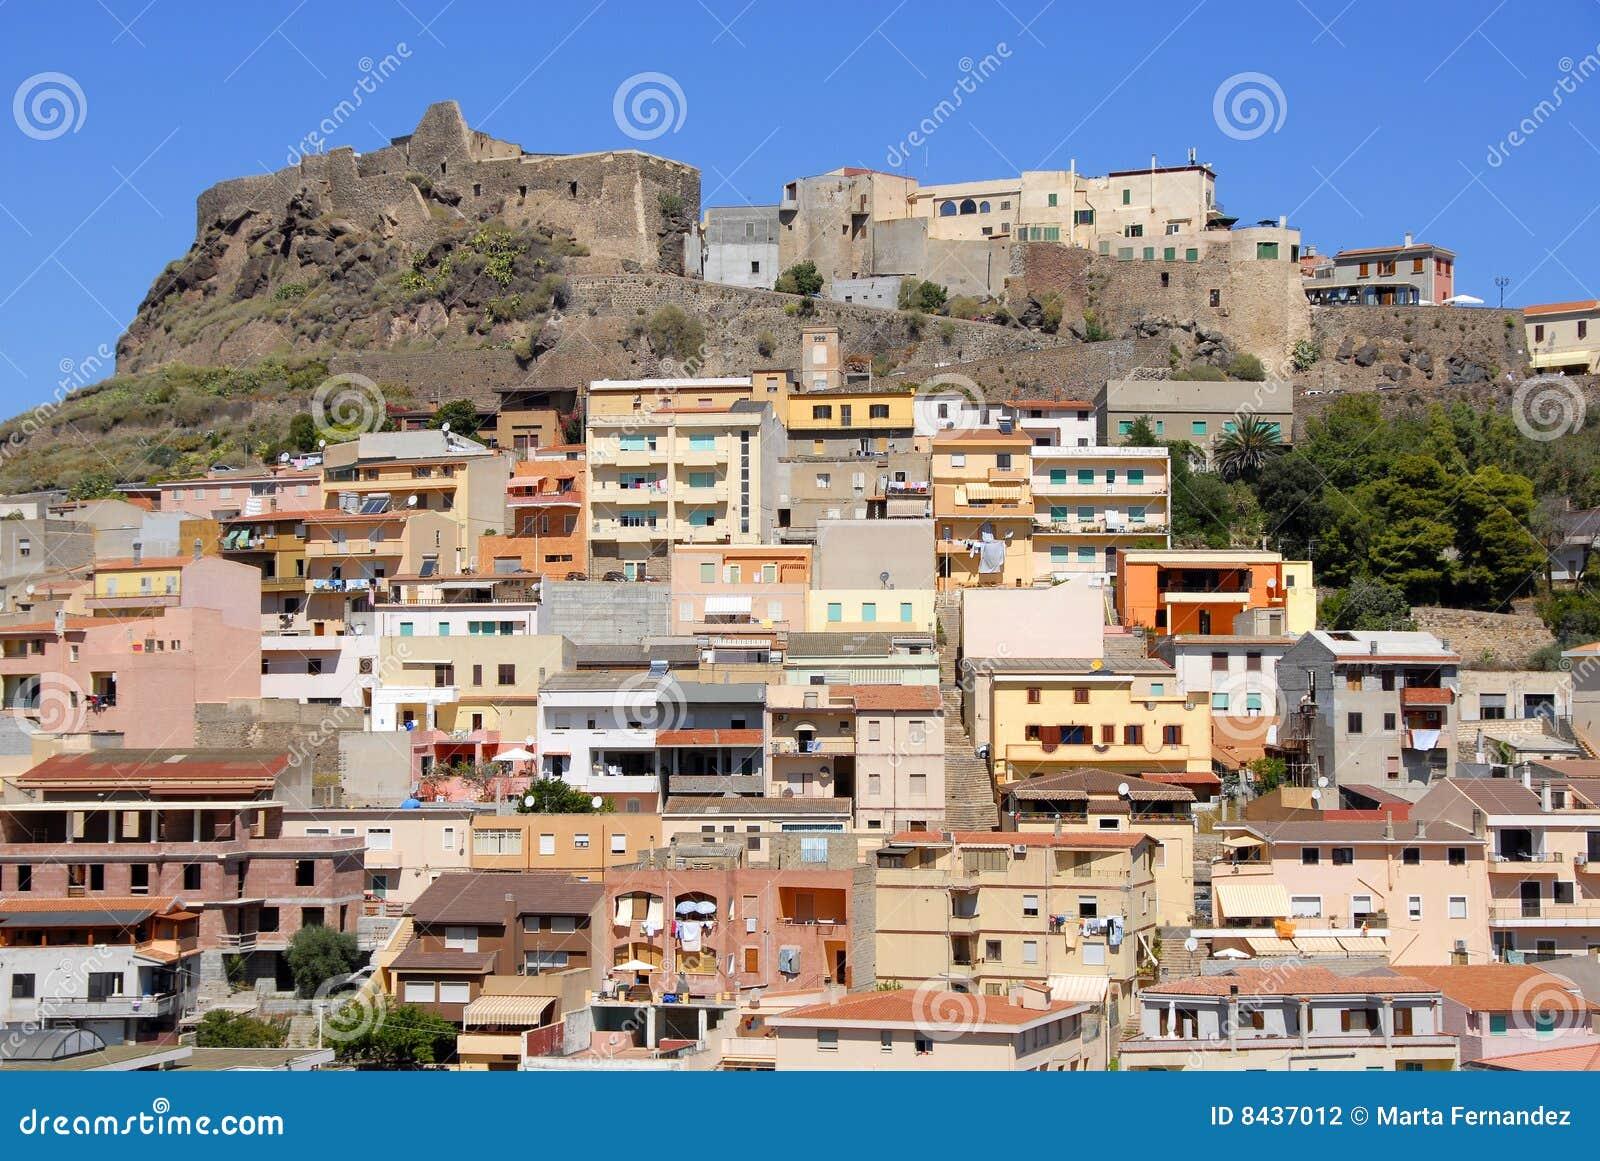 Castelsardo Italy  city photos : Castelsardo, Sardinia, Italy Stock Photography Image: 8437012